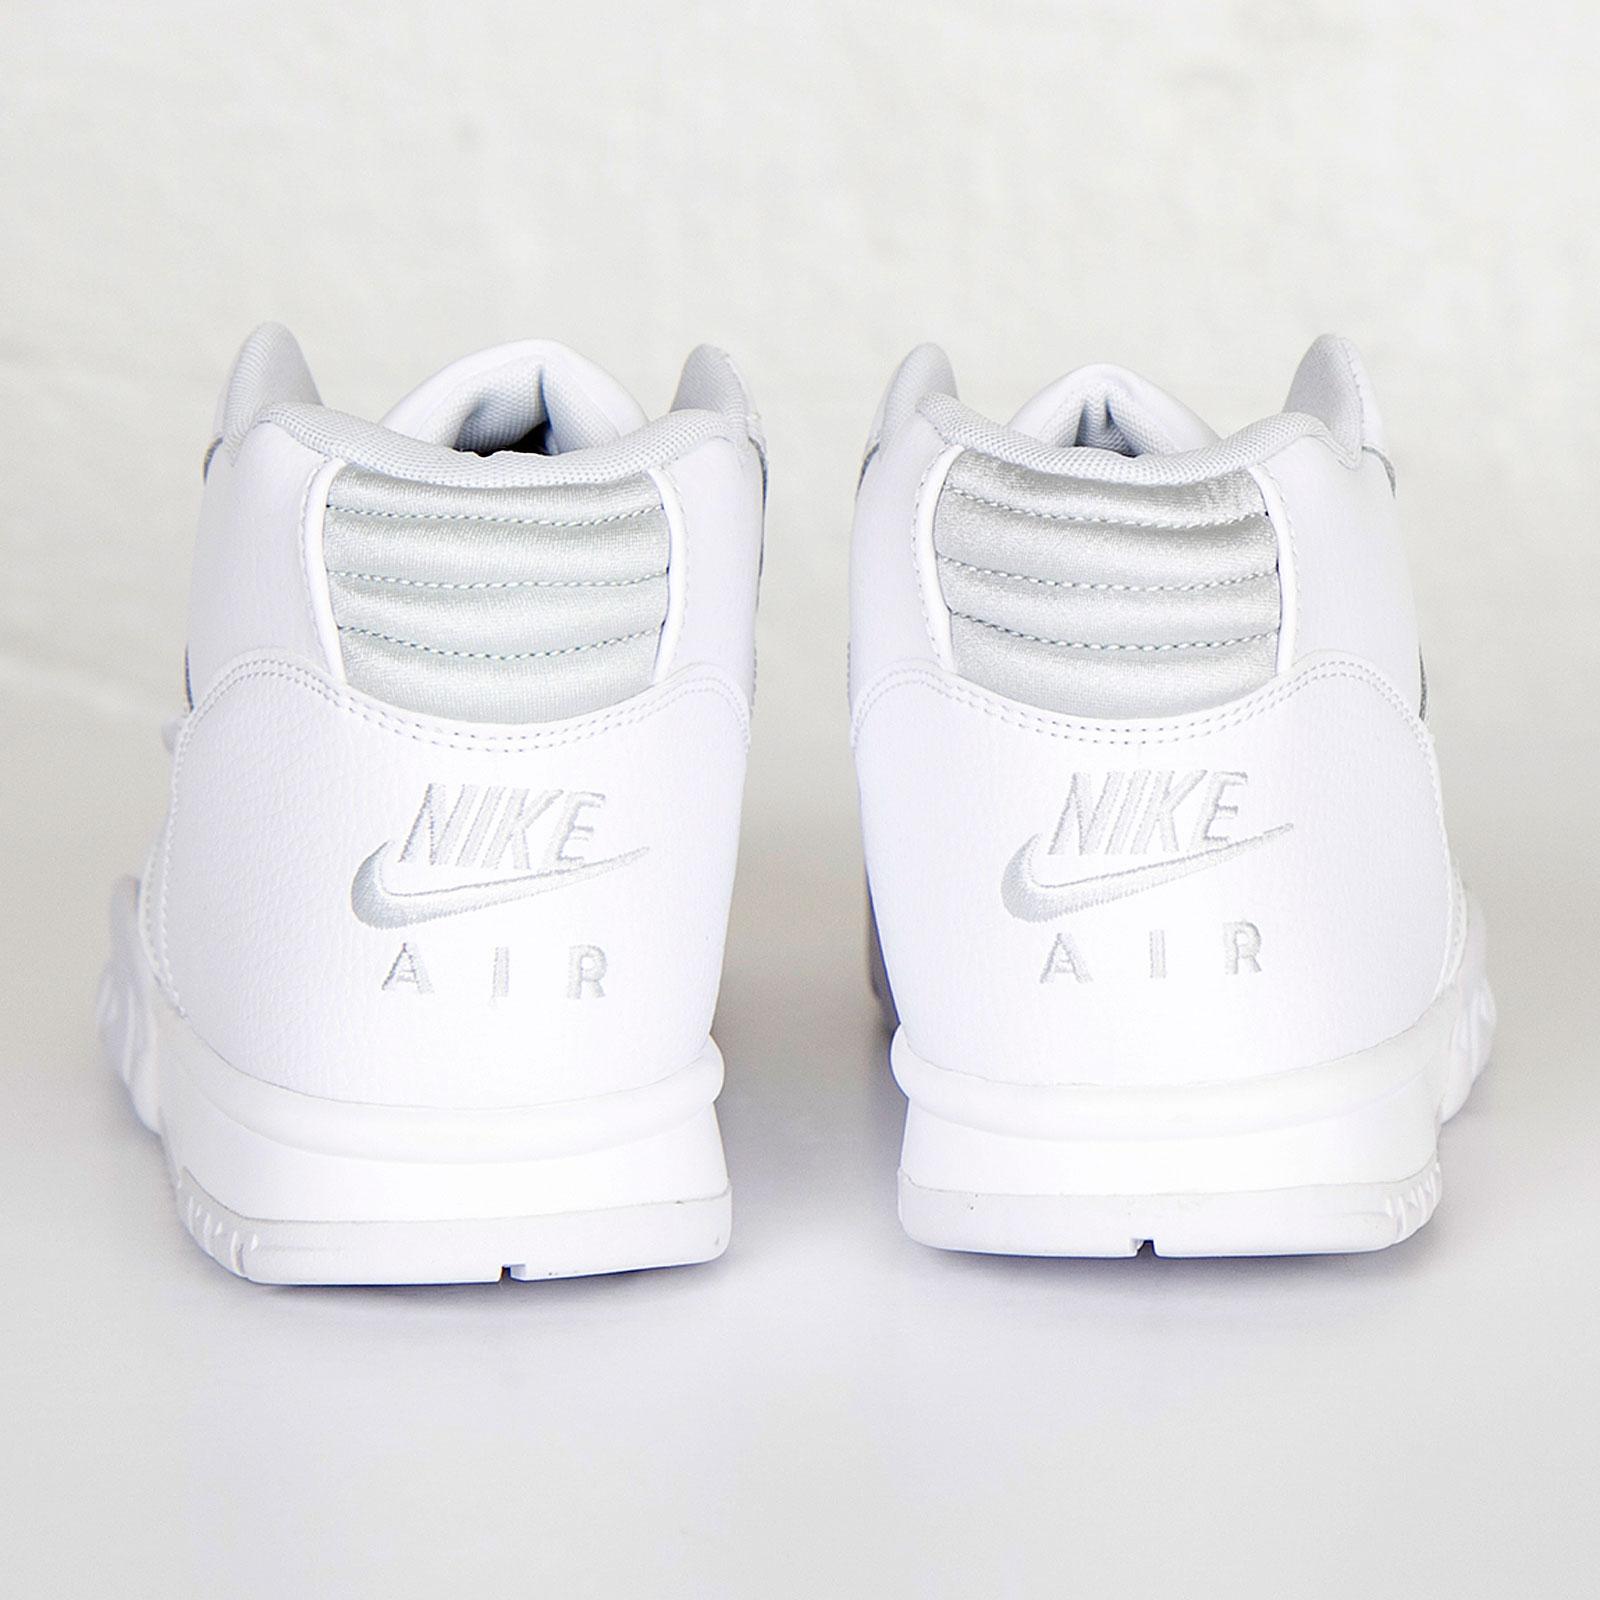 premium selection 90e02 b9f77 Nike Air Trainer 1 Mid - 317554-102 - Sneakersnstuff   sneakers    streetwear på nätet sen 1999